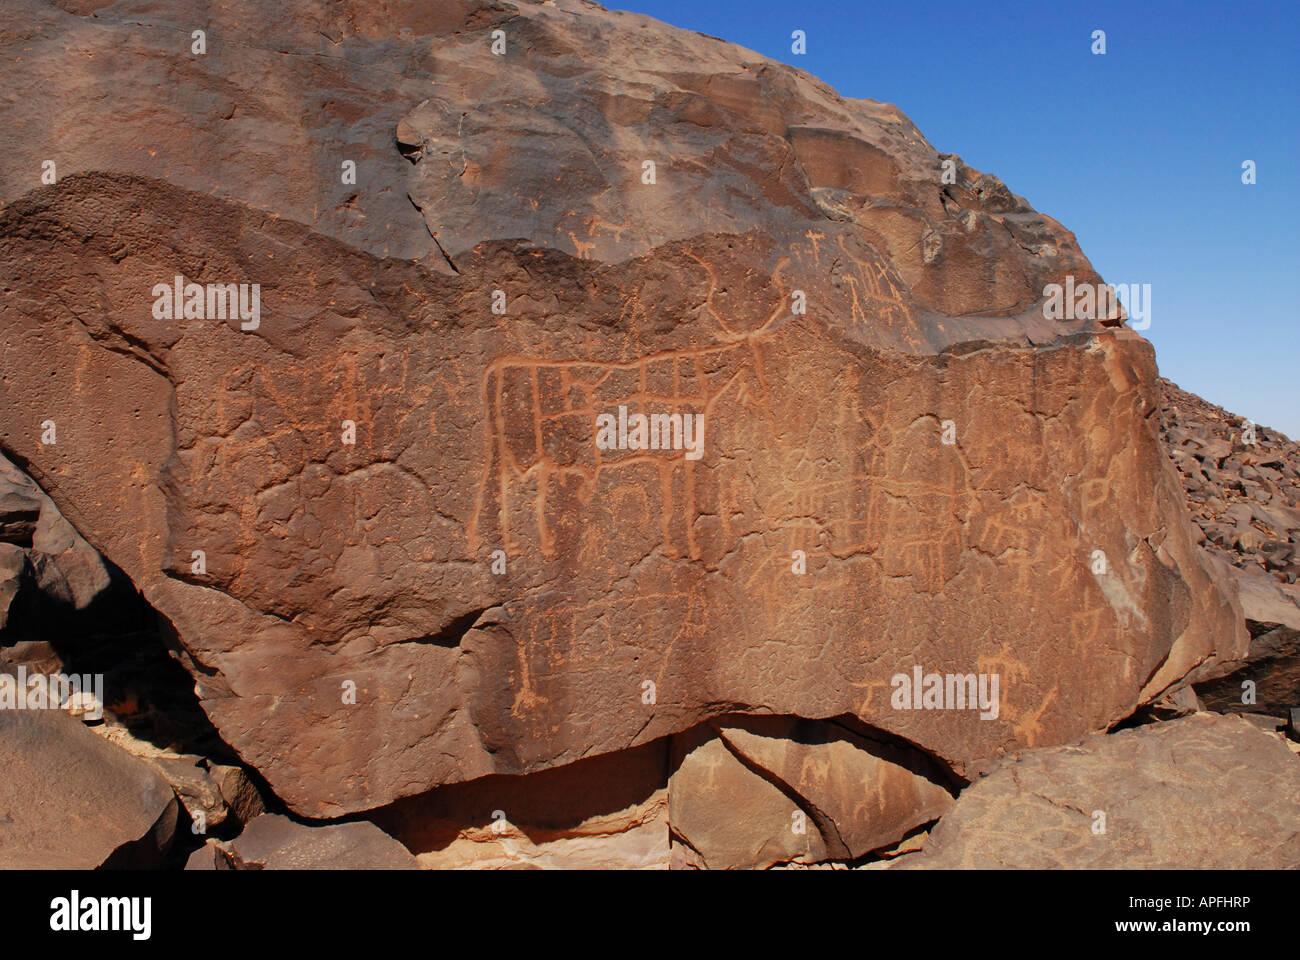 Petroglyphs Africa - Stock Image